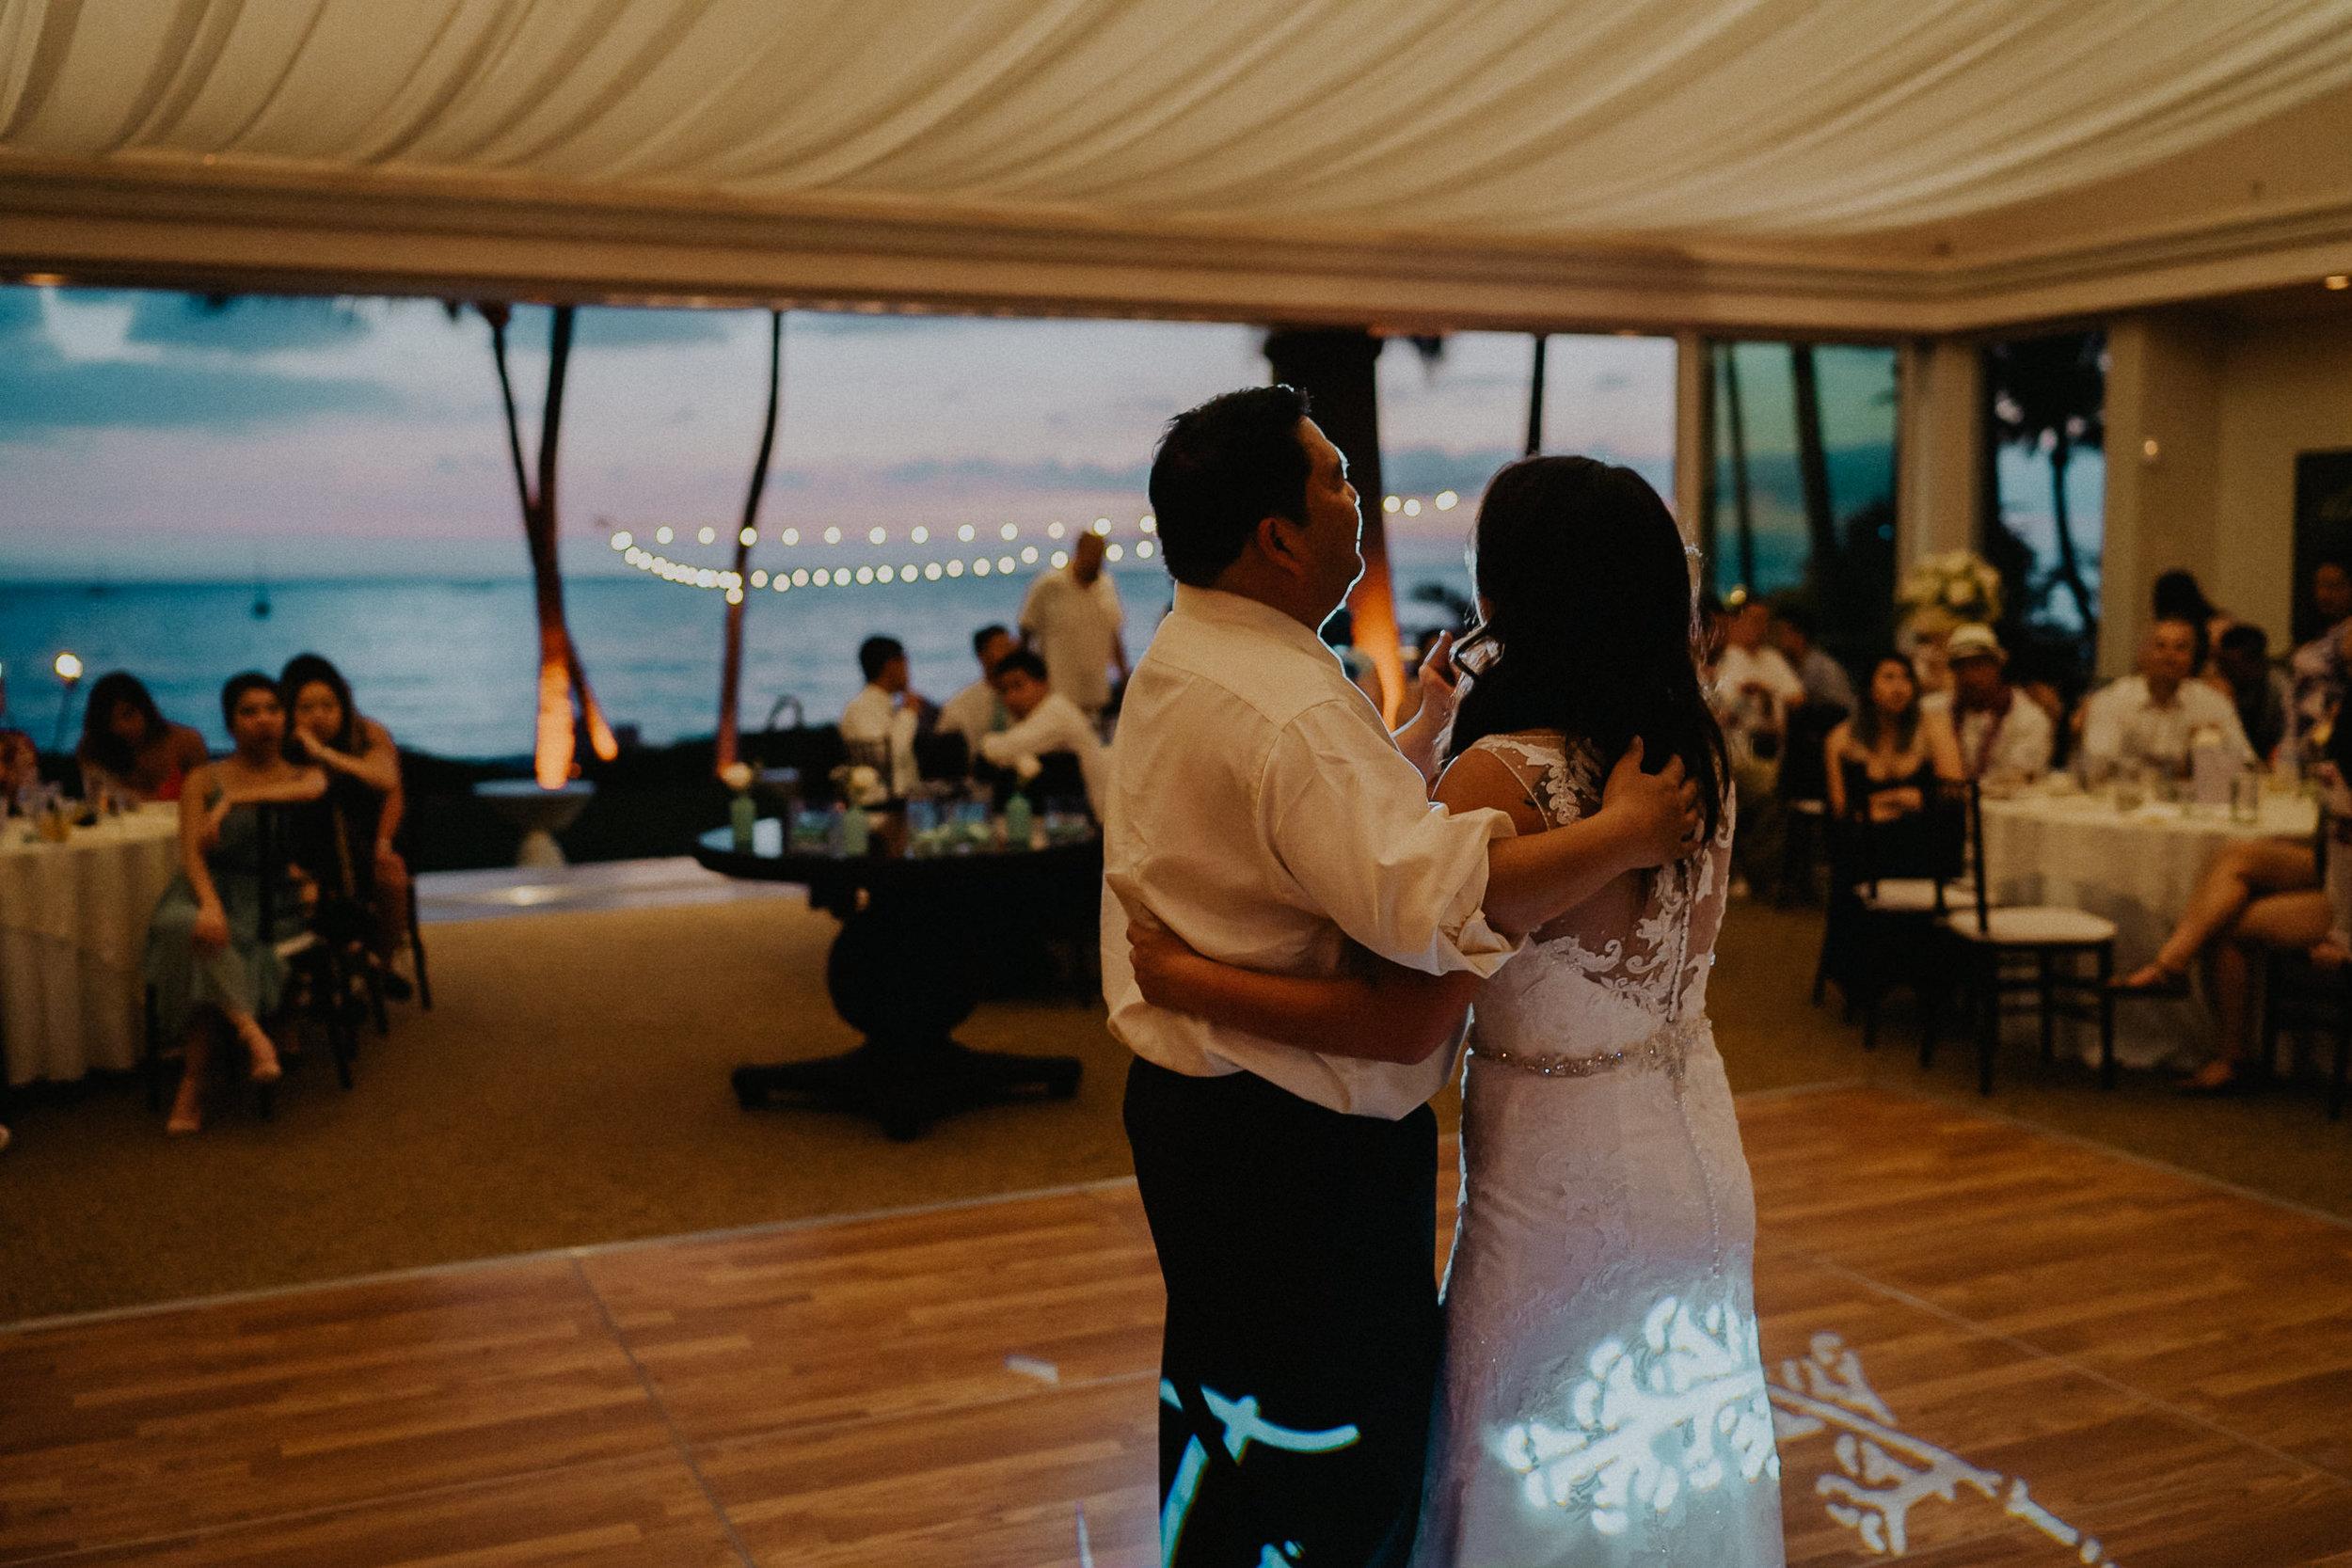 Maui_Destination_wedding_Alfred_Tang-64.jpg